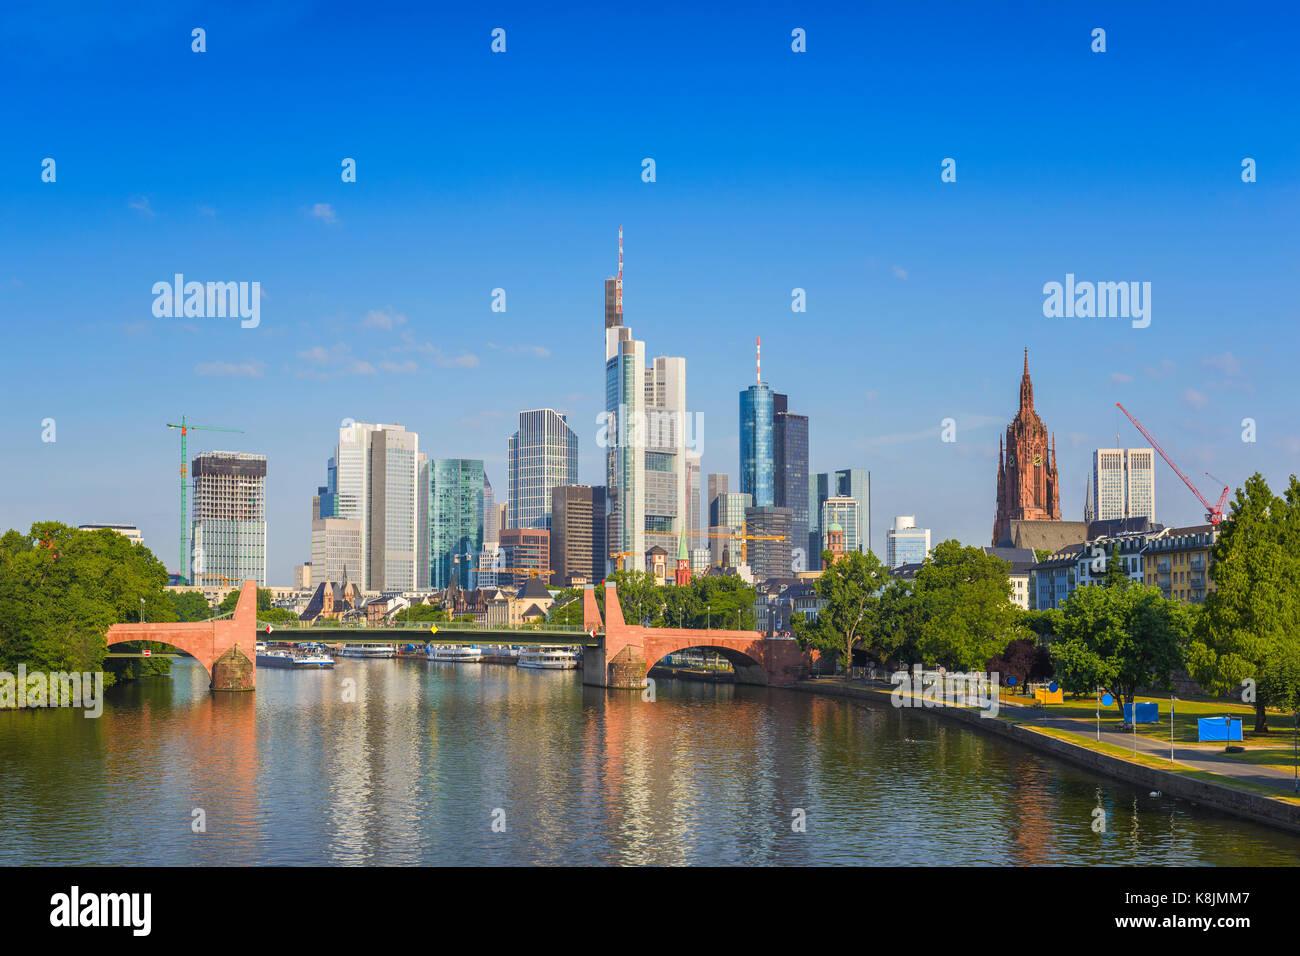 Frankfurt City Skyline bei Business District, Frankfurt, Deutschland Stockbild